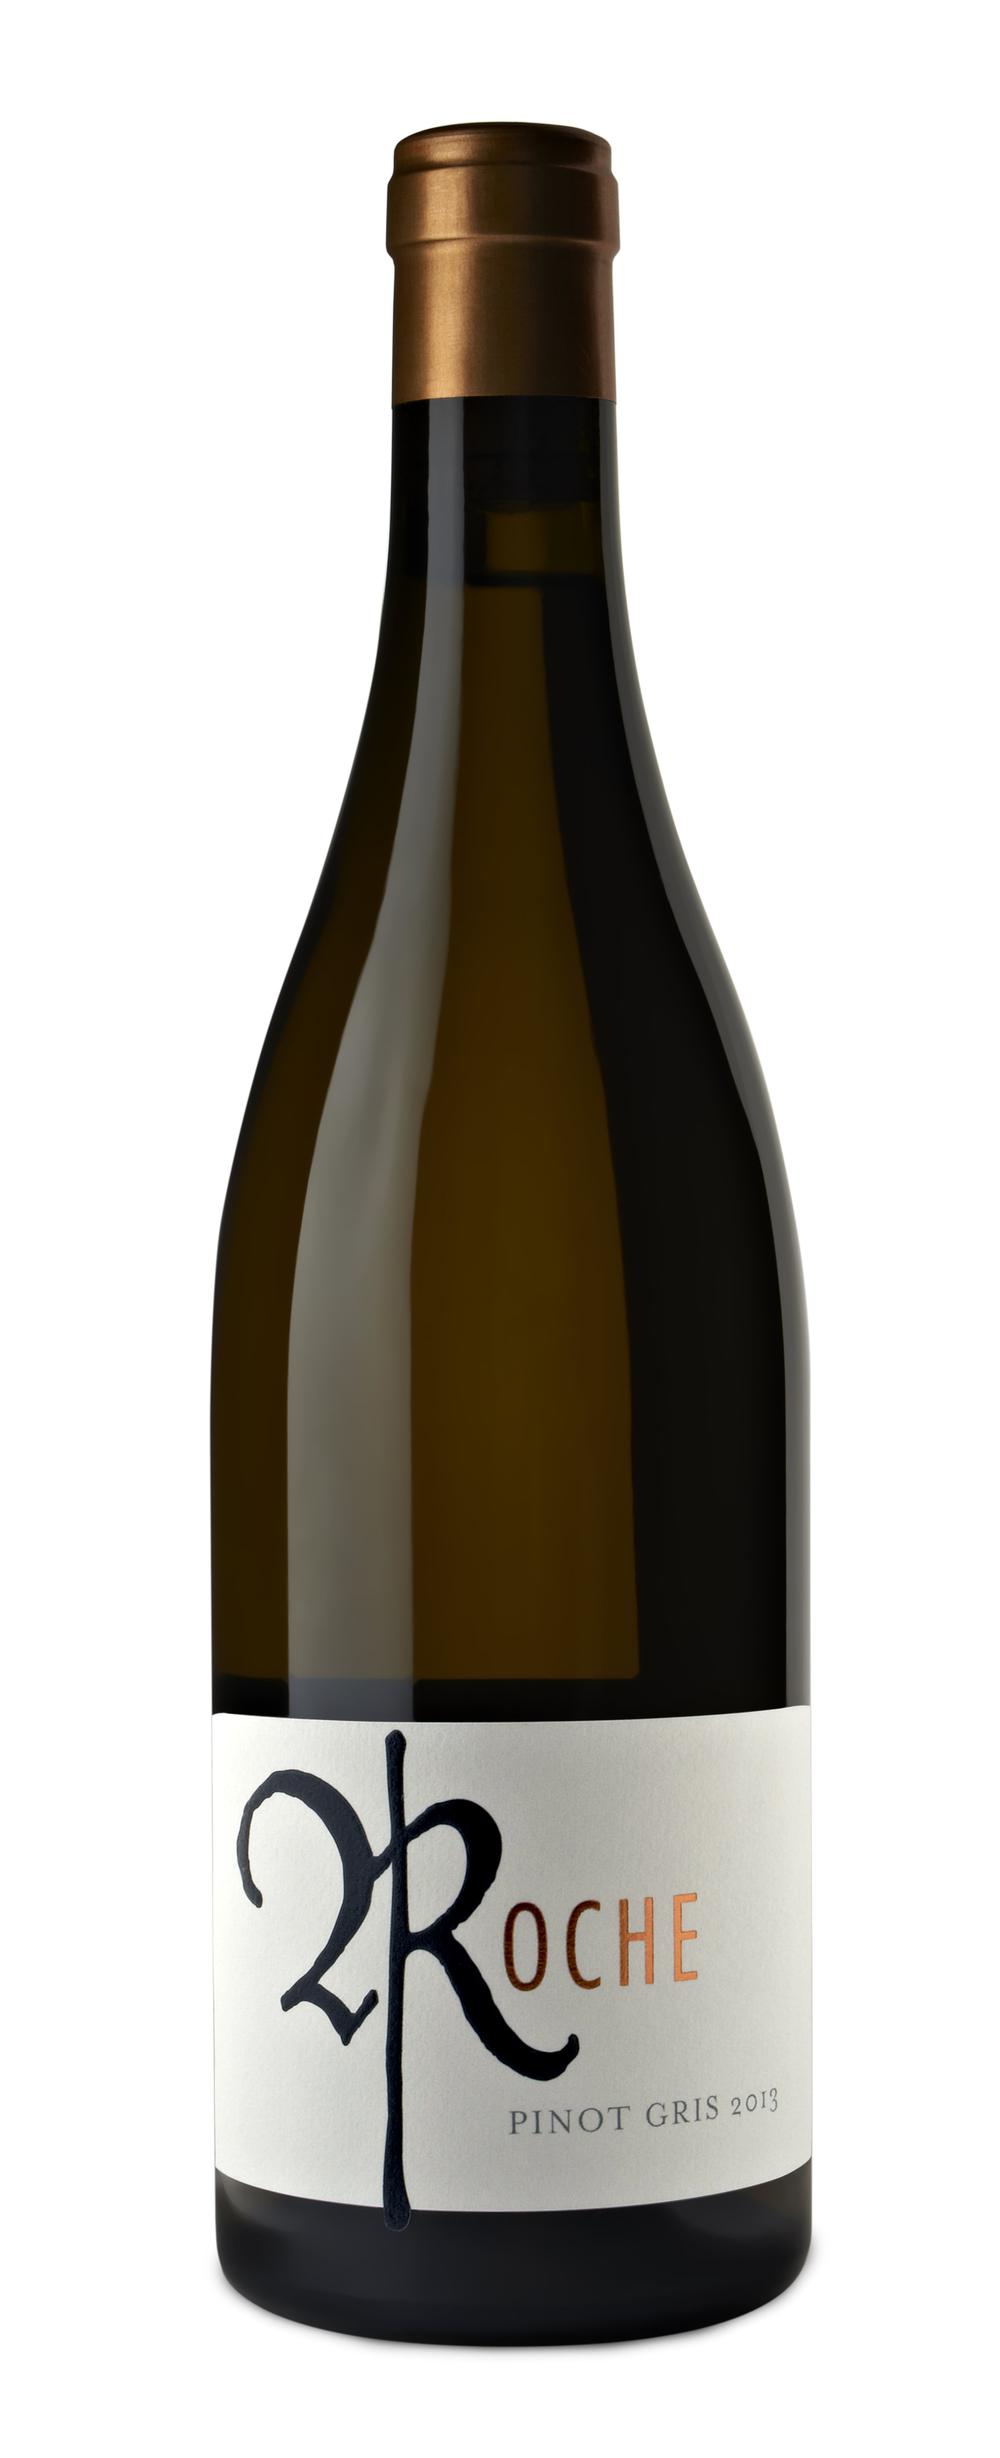 Roche-Pinot-Gris